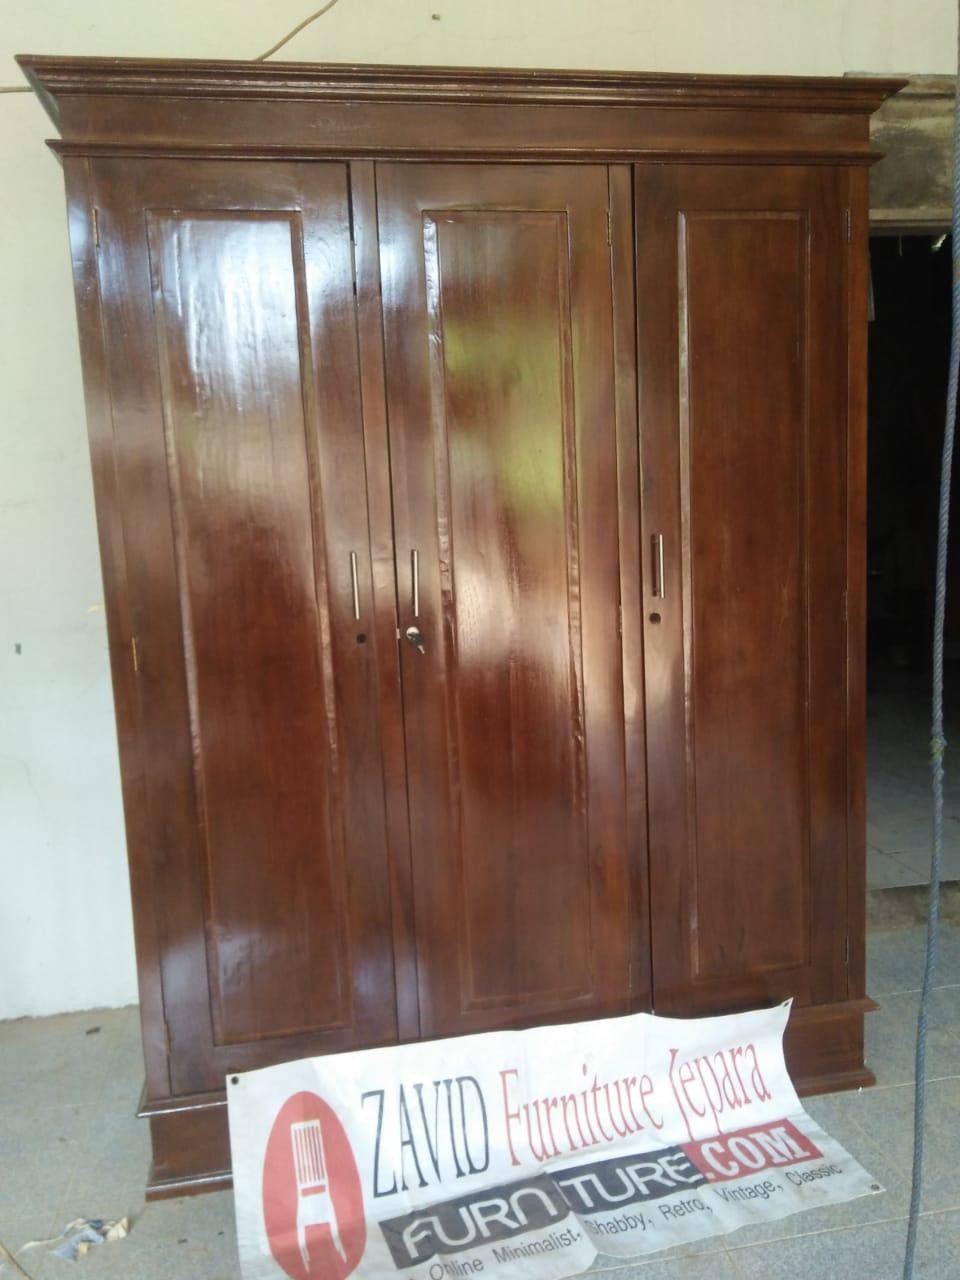 jual-lemari-pakaian-jati-3-pintu Jual Lemari Pakaian Kediri 3 Pintu Kayu Jati Minimalis